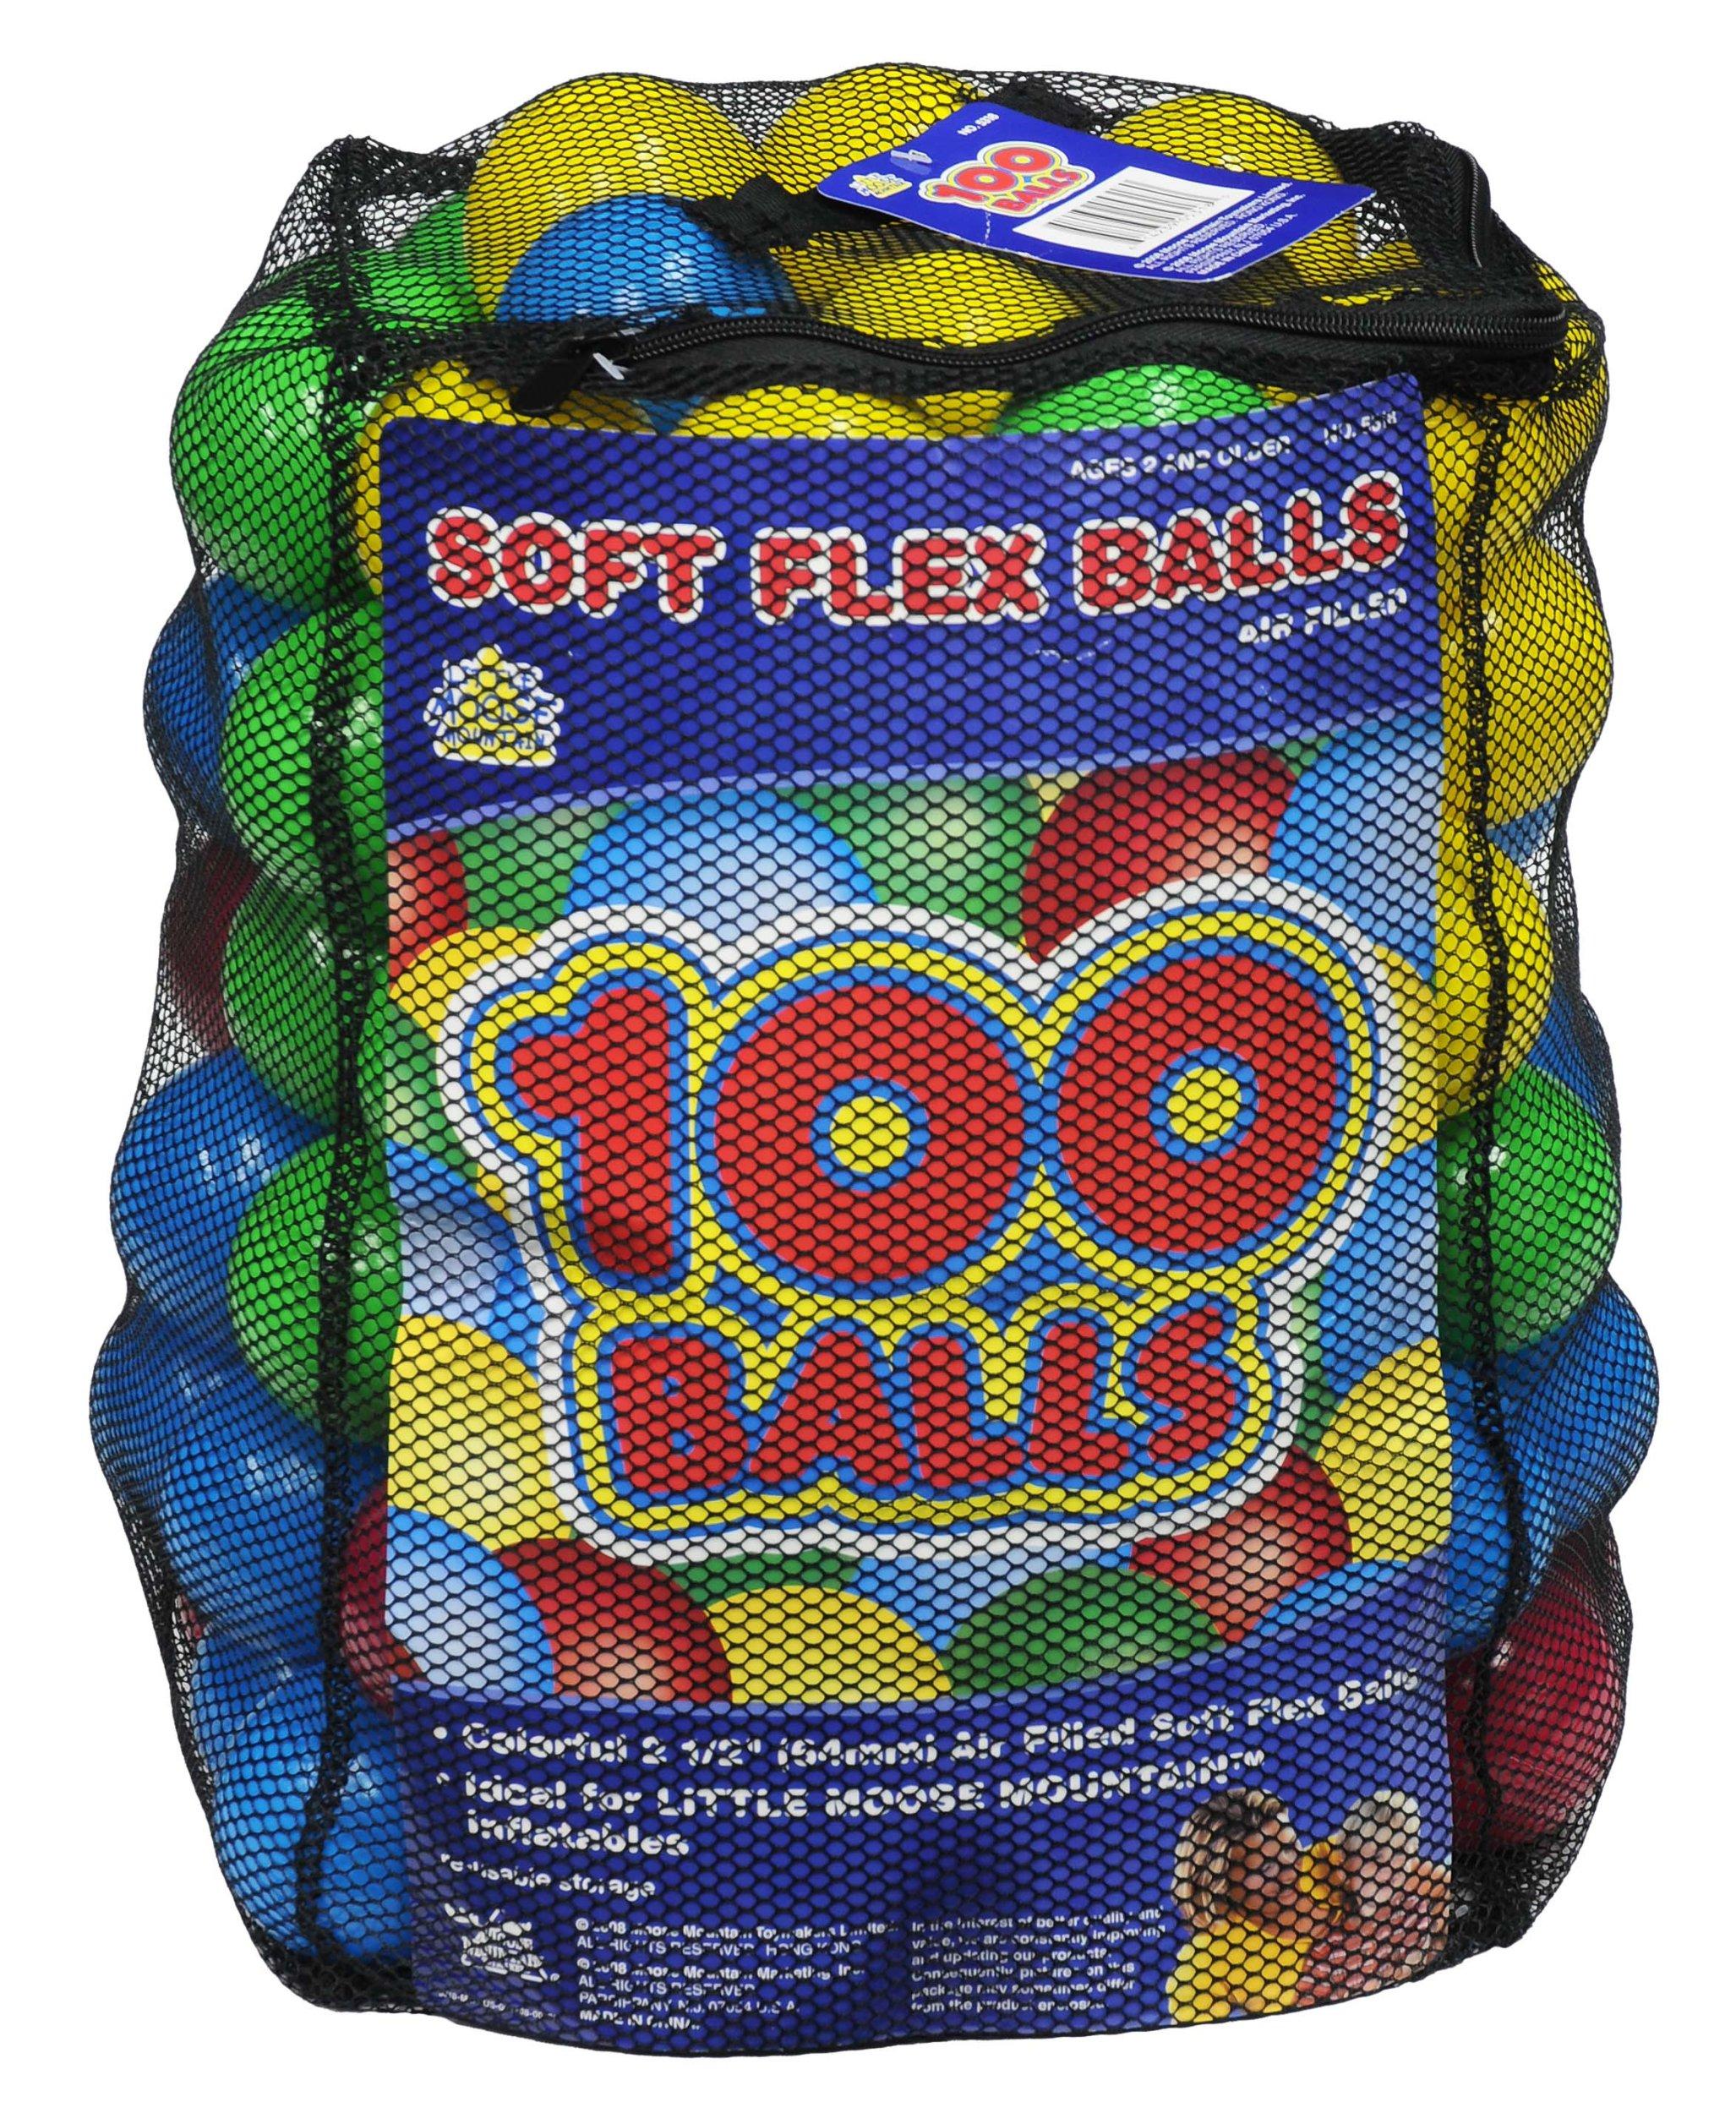 Moose Mountain, Ball Pit Balls - 100 Soft-Flex Balls in Mesh Bag, Multi Color, 12'' W x 12'' D x 12.5'' H